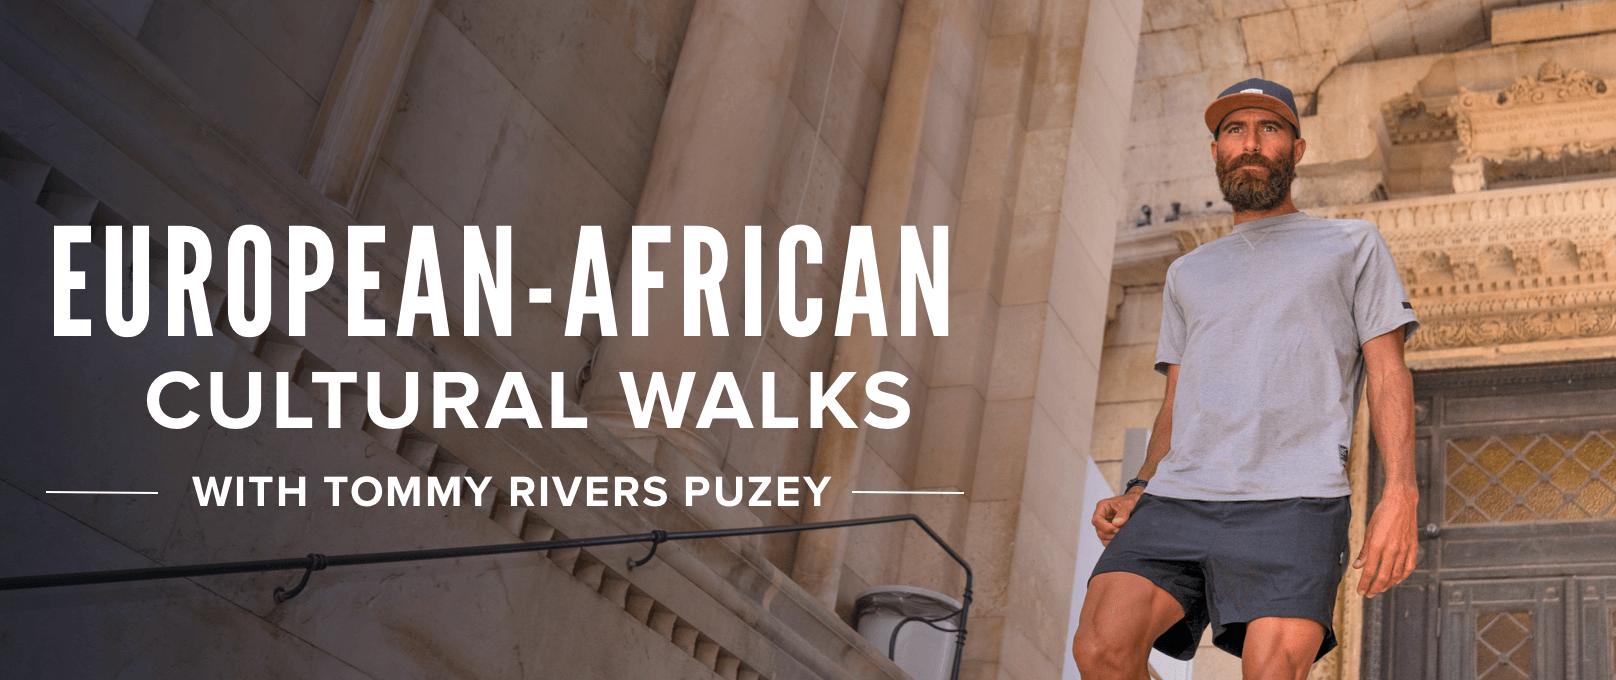 iFit European-African Cultural Walks Series walking workouts